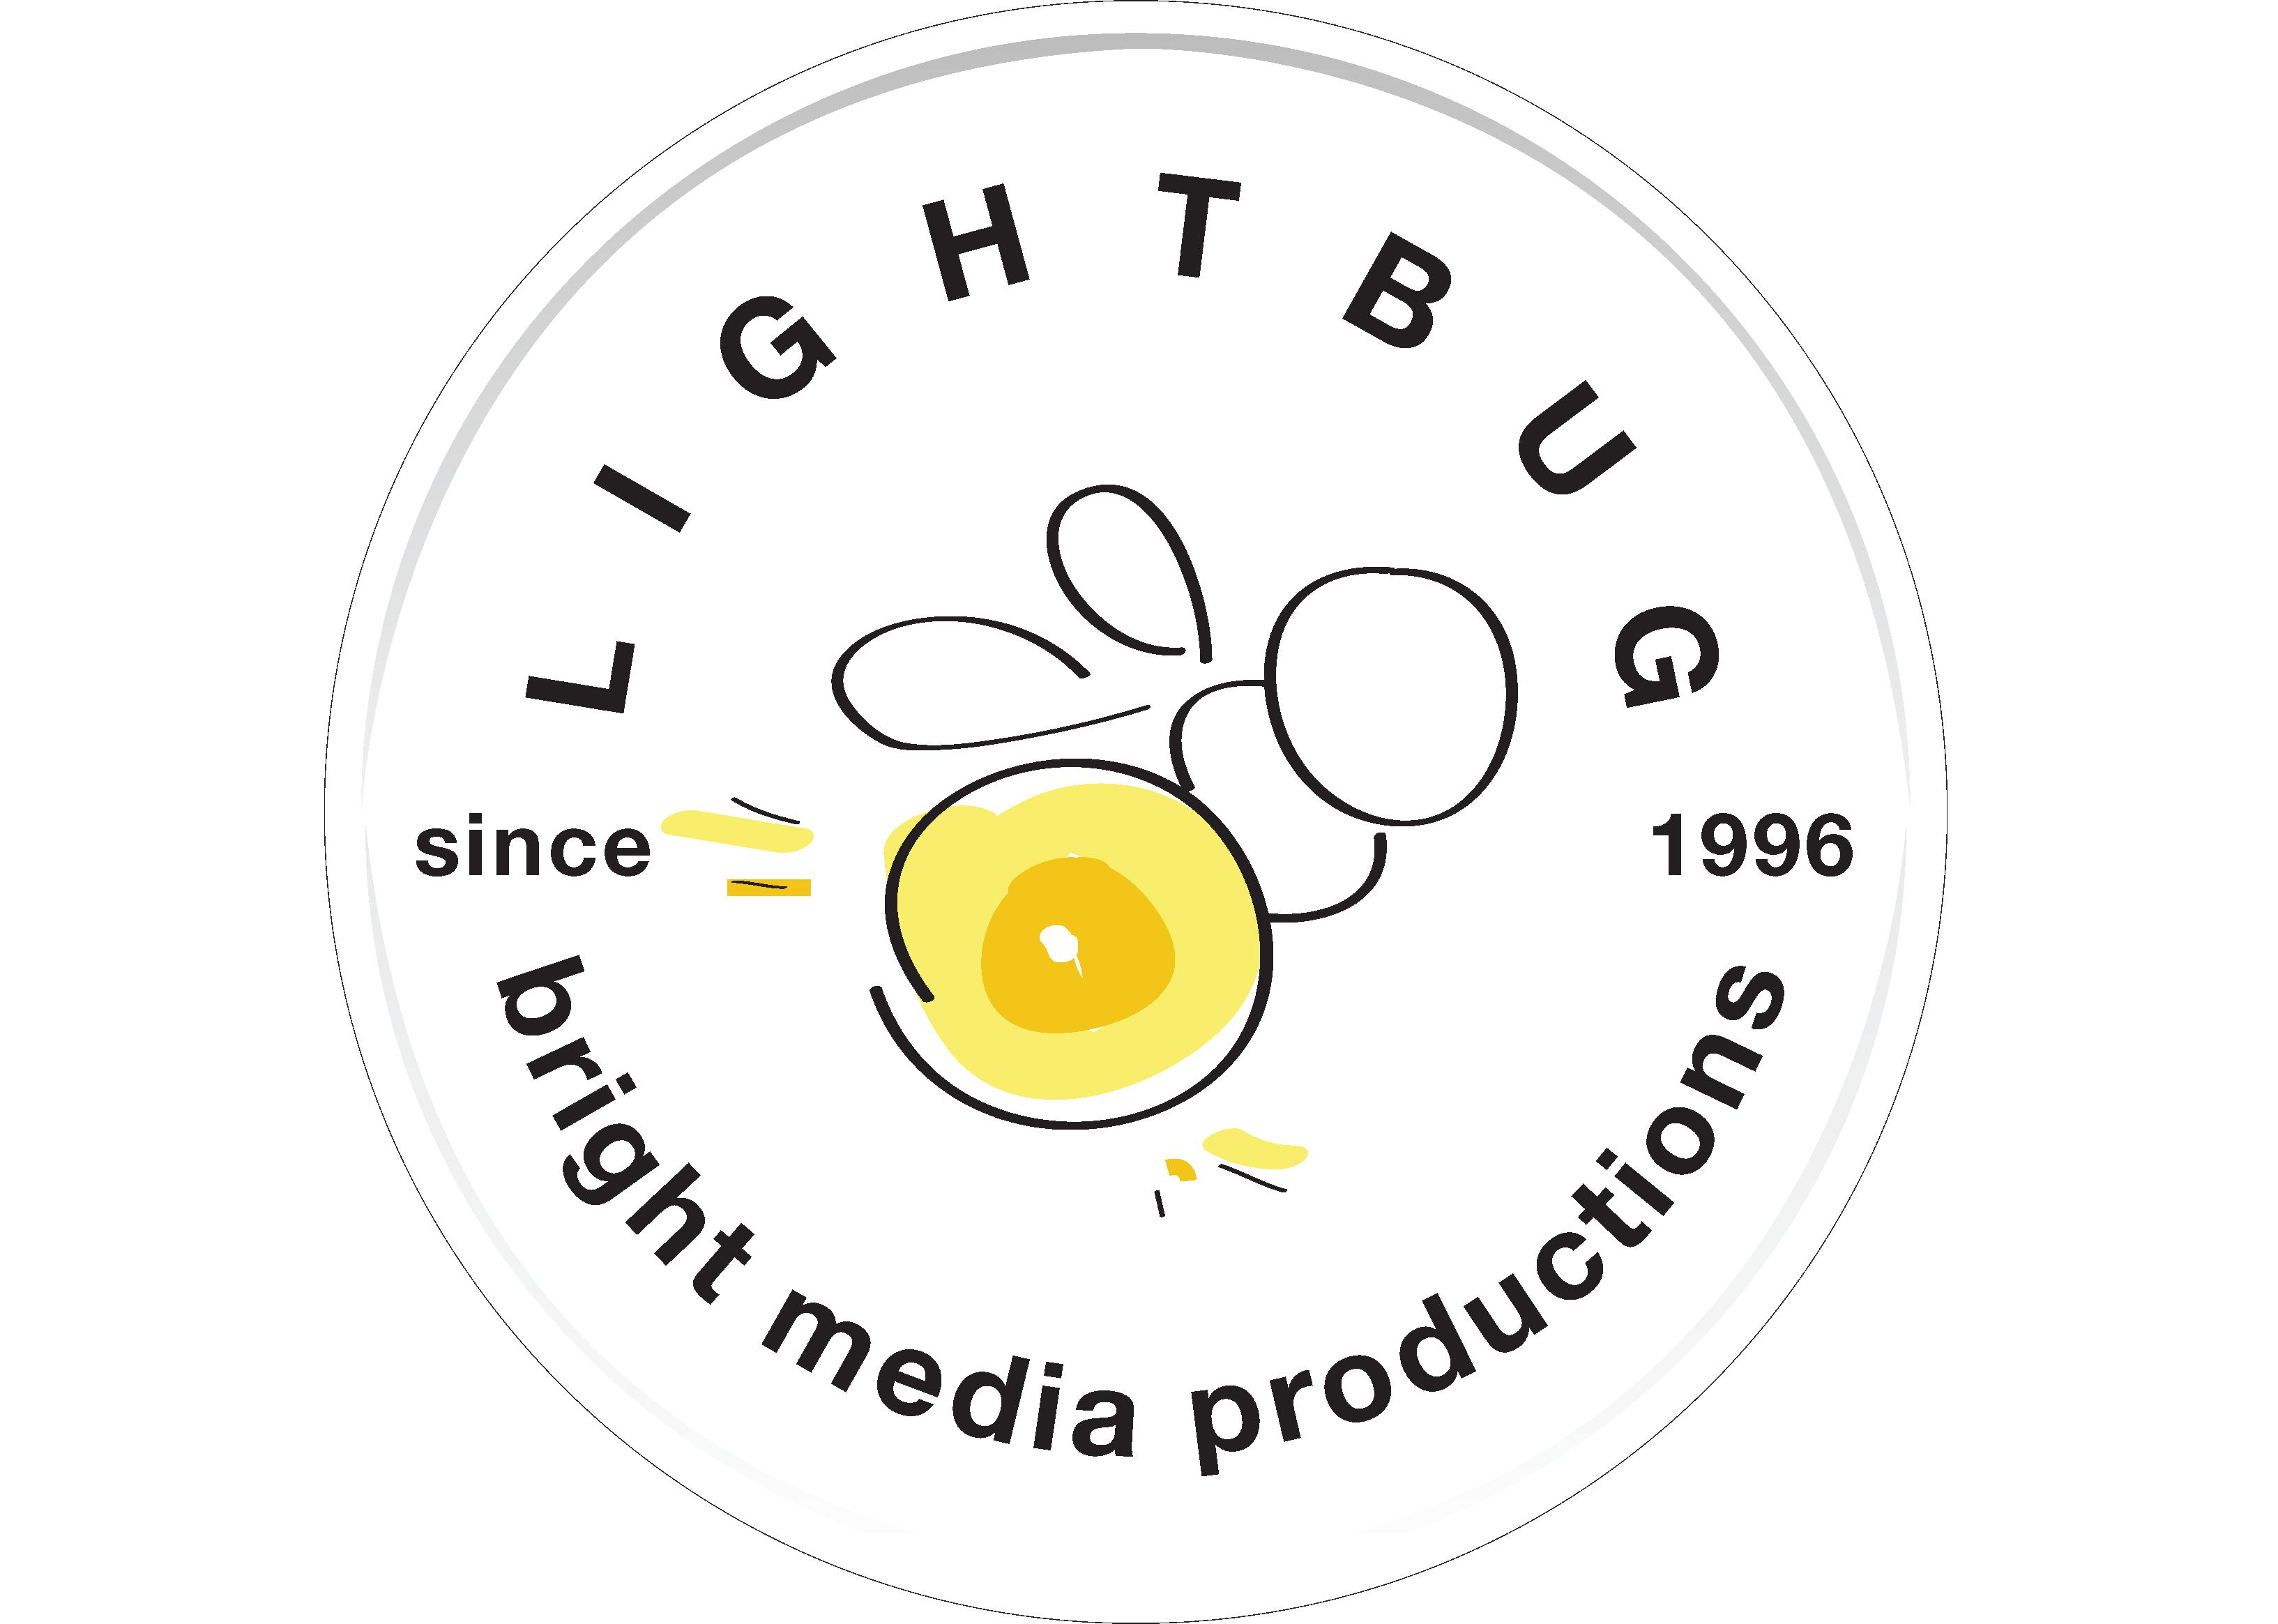 Lightbug Media Productions